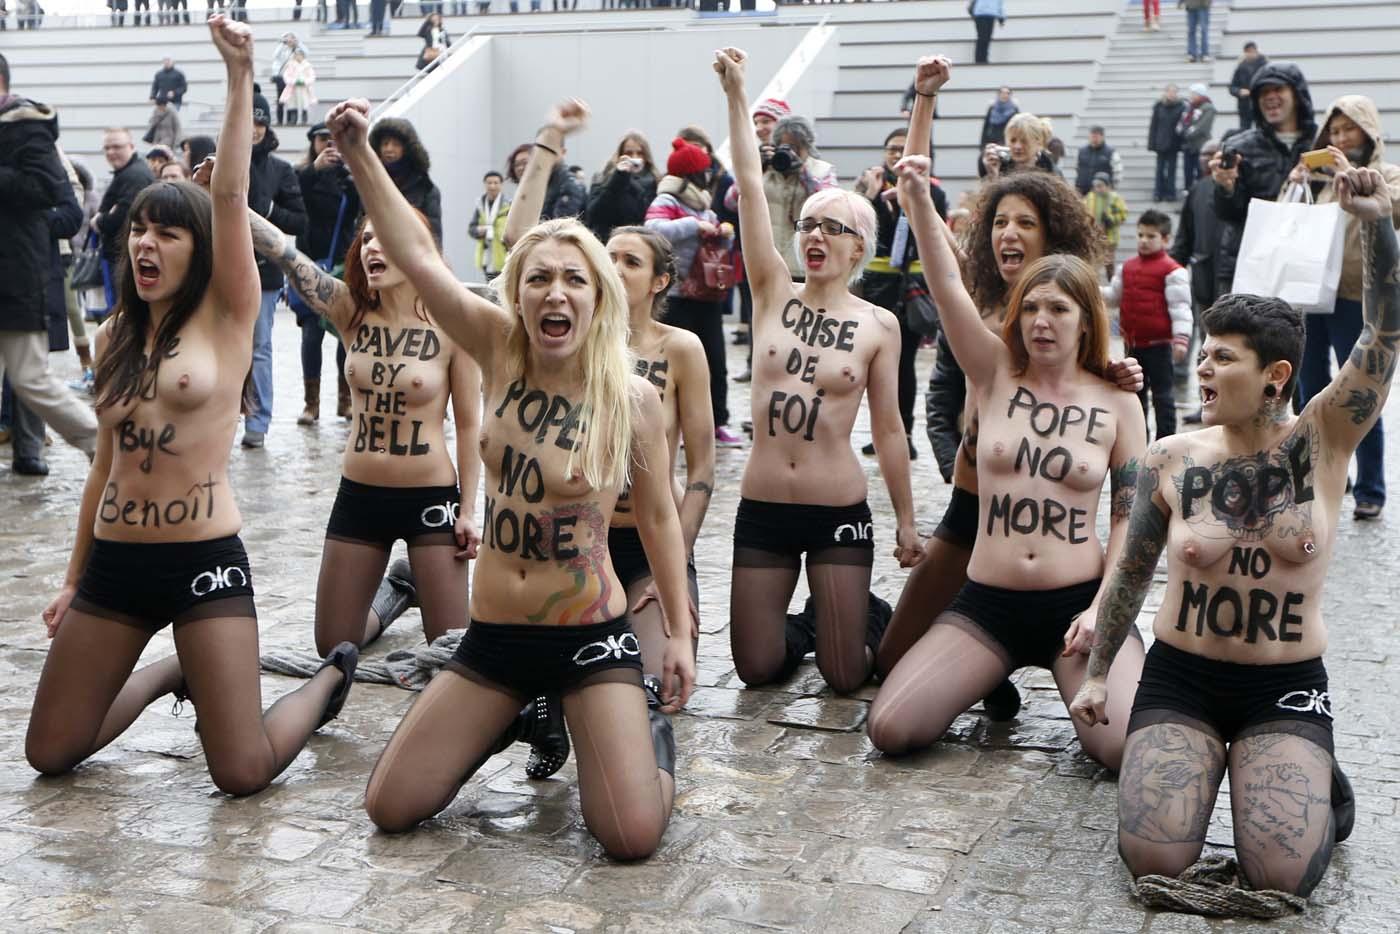 Activists from the women's rights organisation Femen shout slogans outside Notre-Dame de Paris Cathedral  in Paris